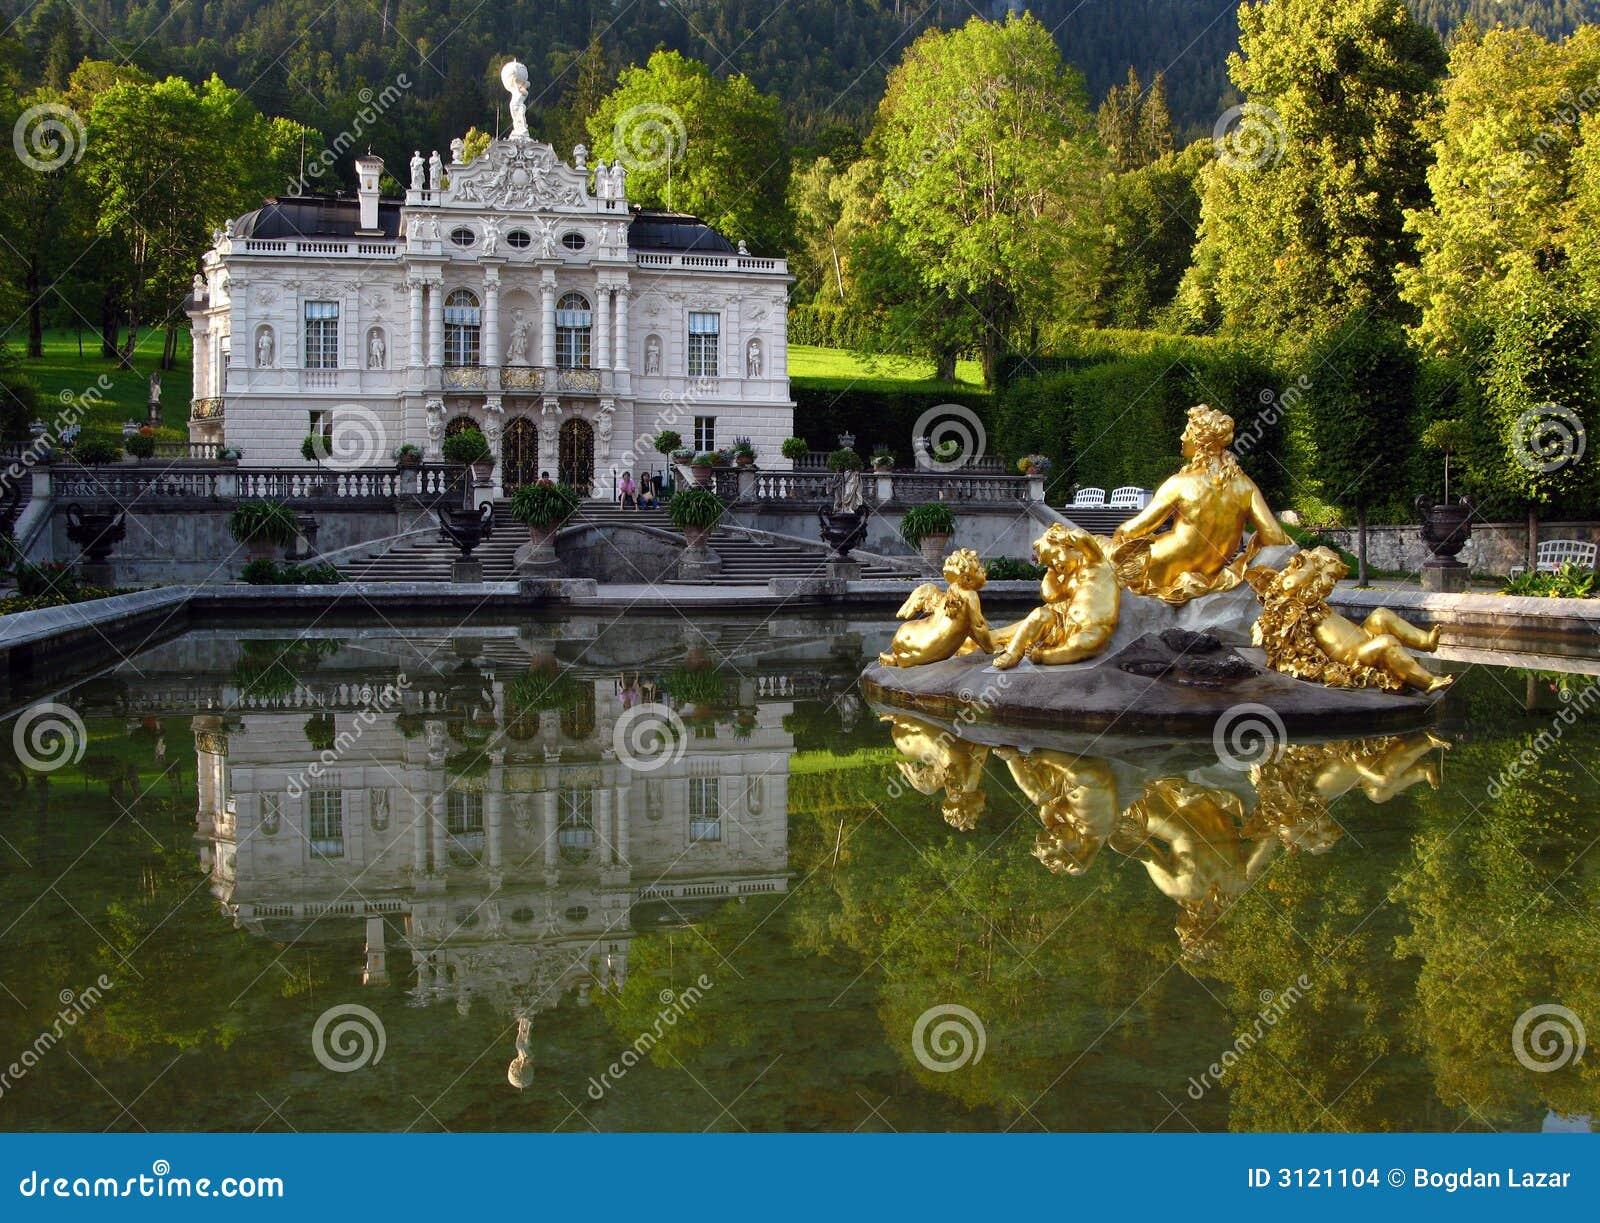 Linderhof Palace 04, Germany